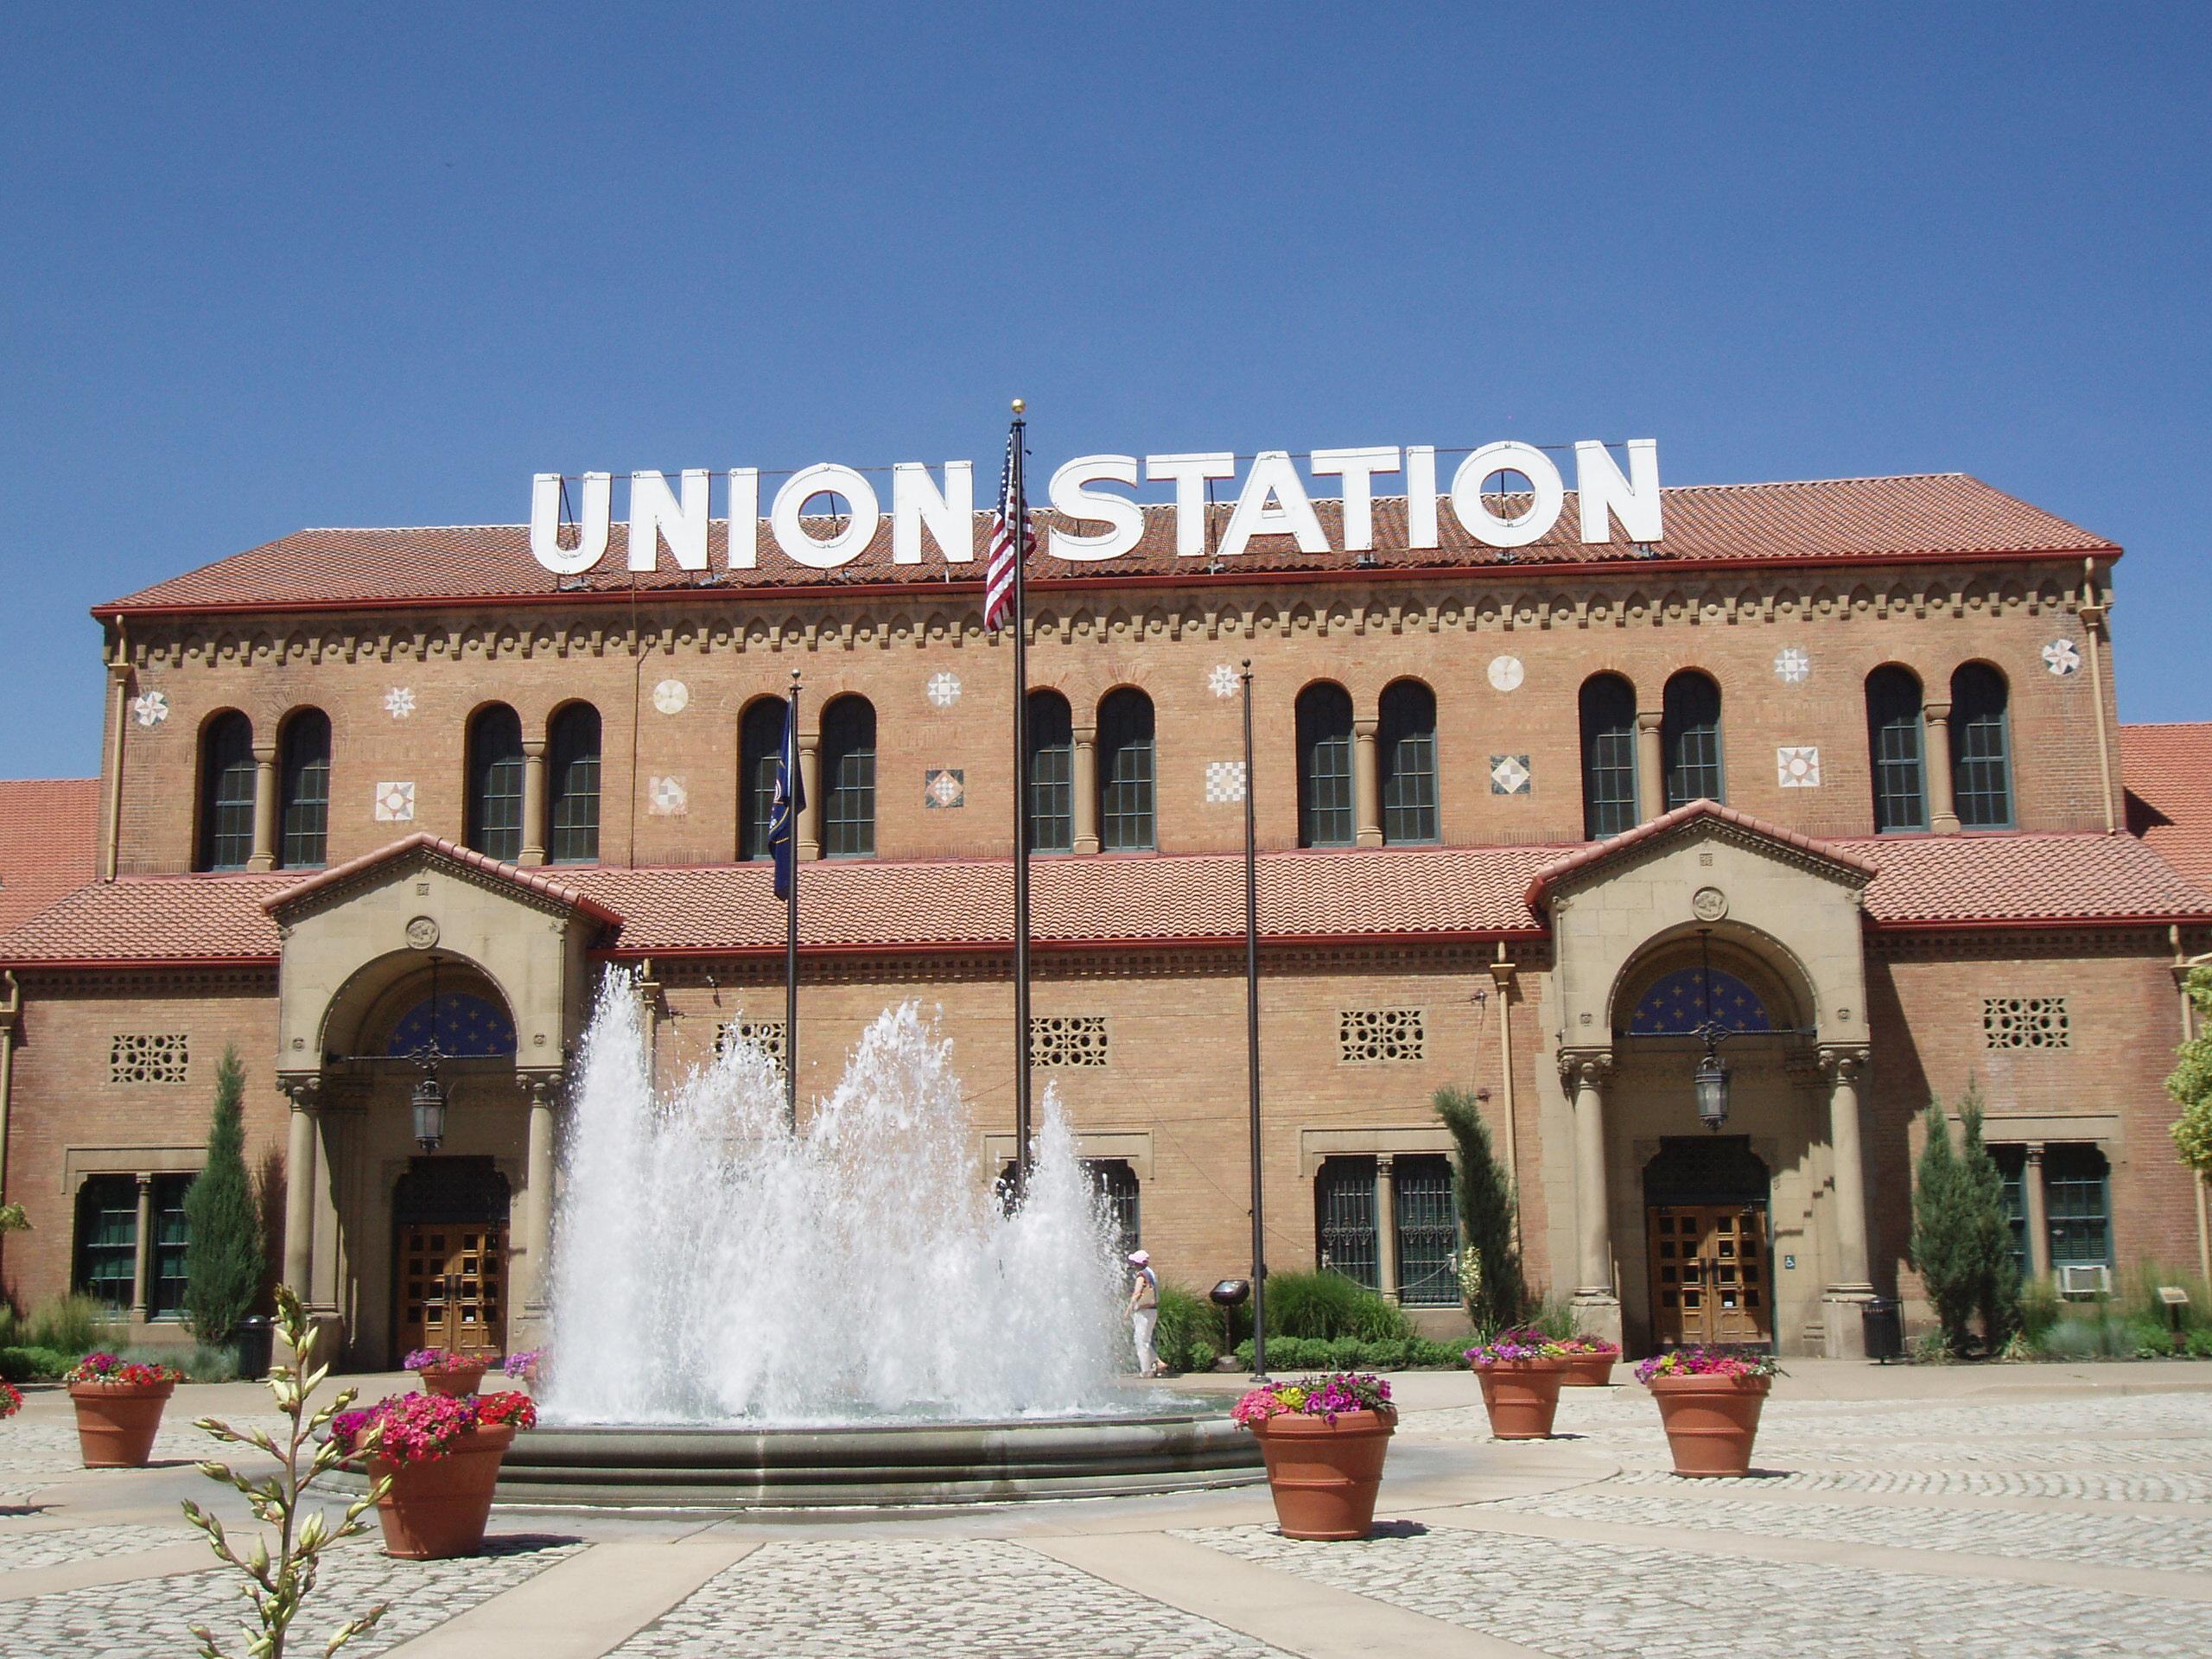 English: Union Station in Ogden, Utah.